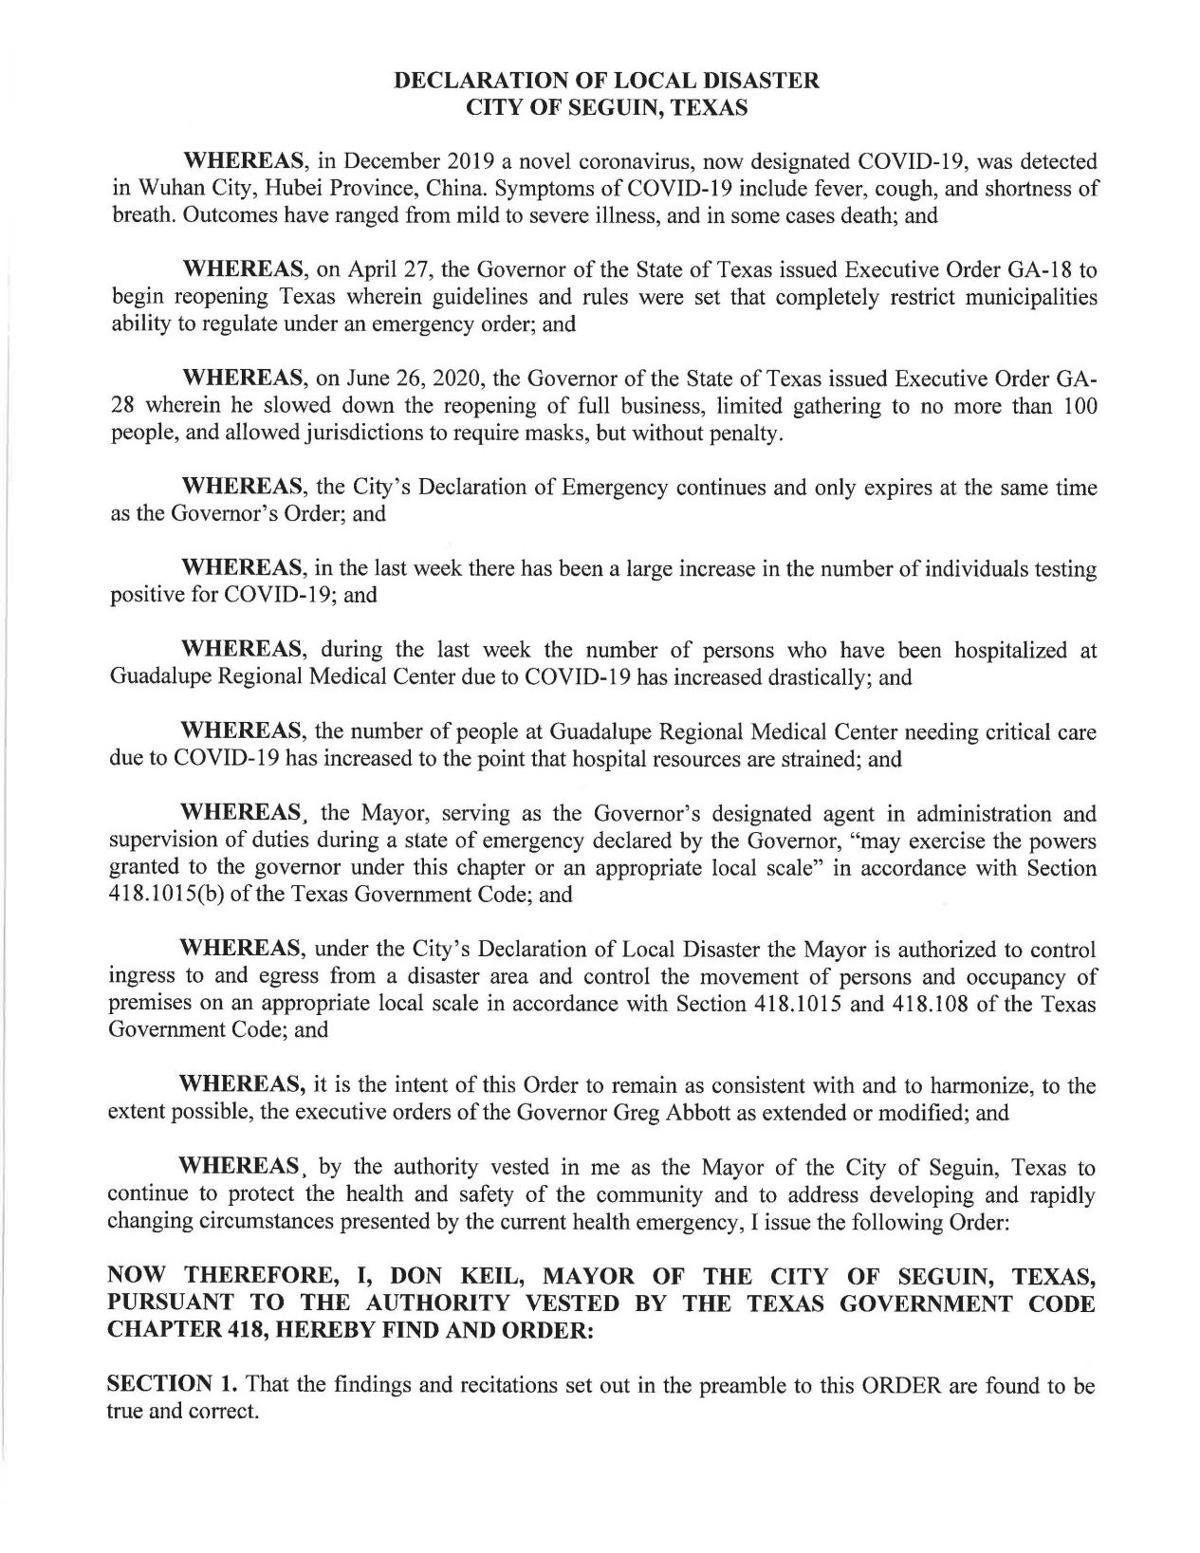 Mandatory Mask Declaration by Mayor Keil 1.jpg